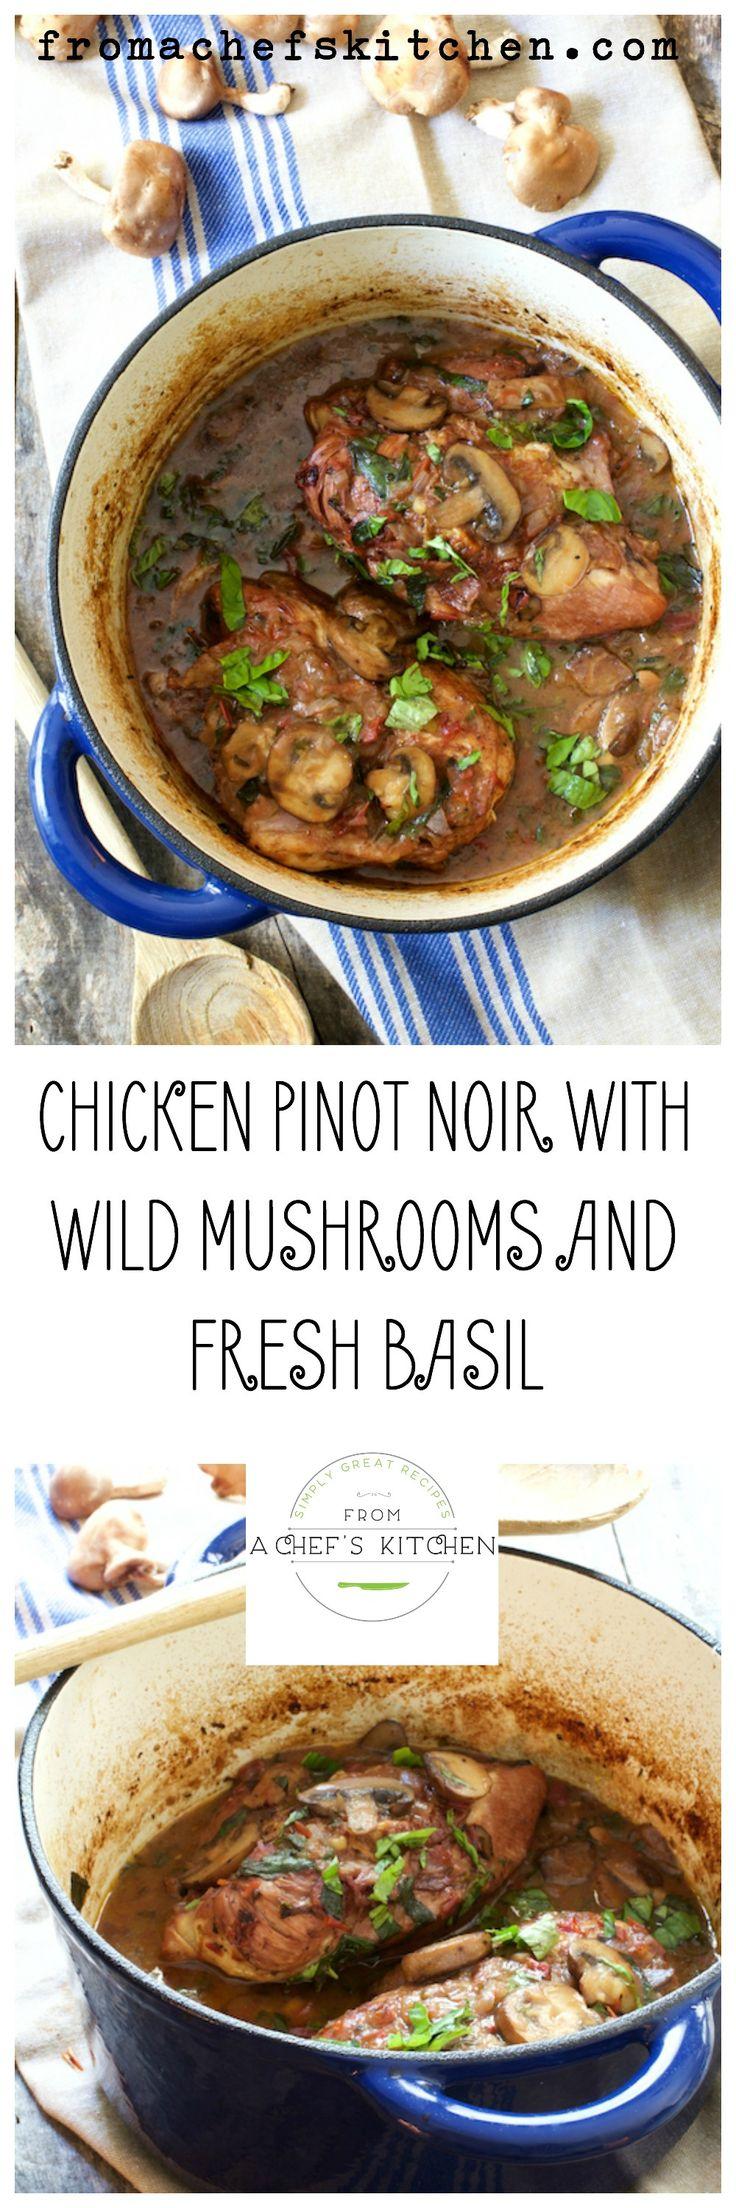 Chicken Pinot Noir with Wild Mushrooms and Fresh Basil